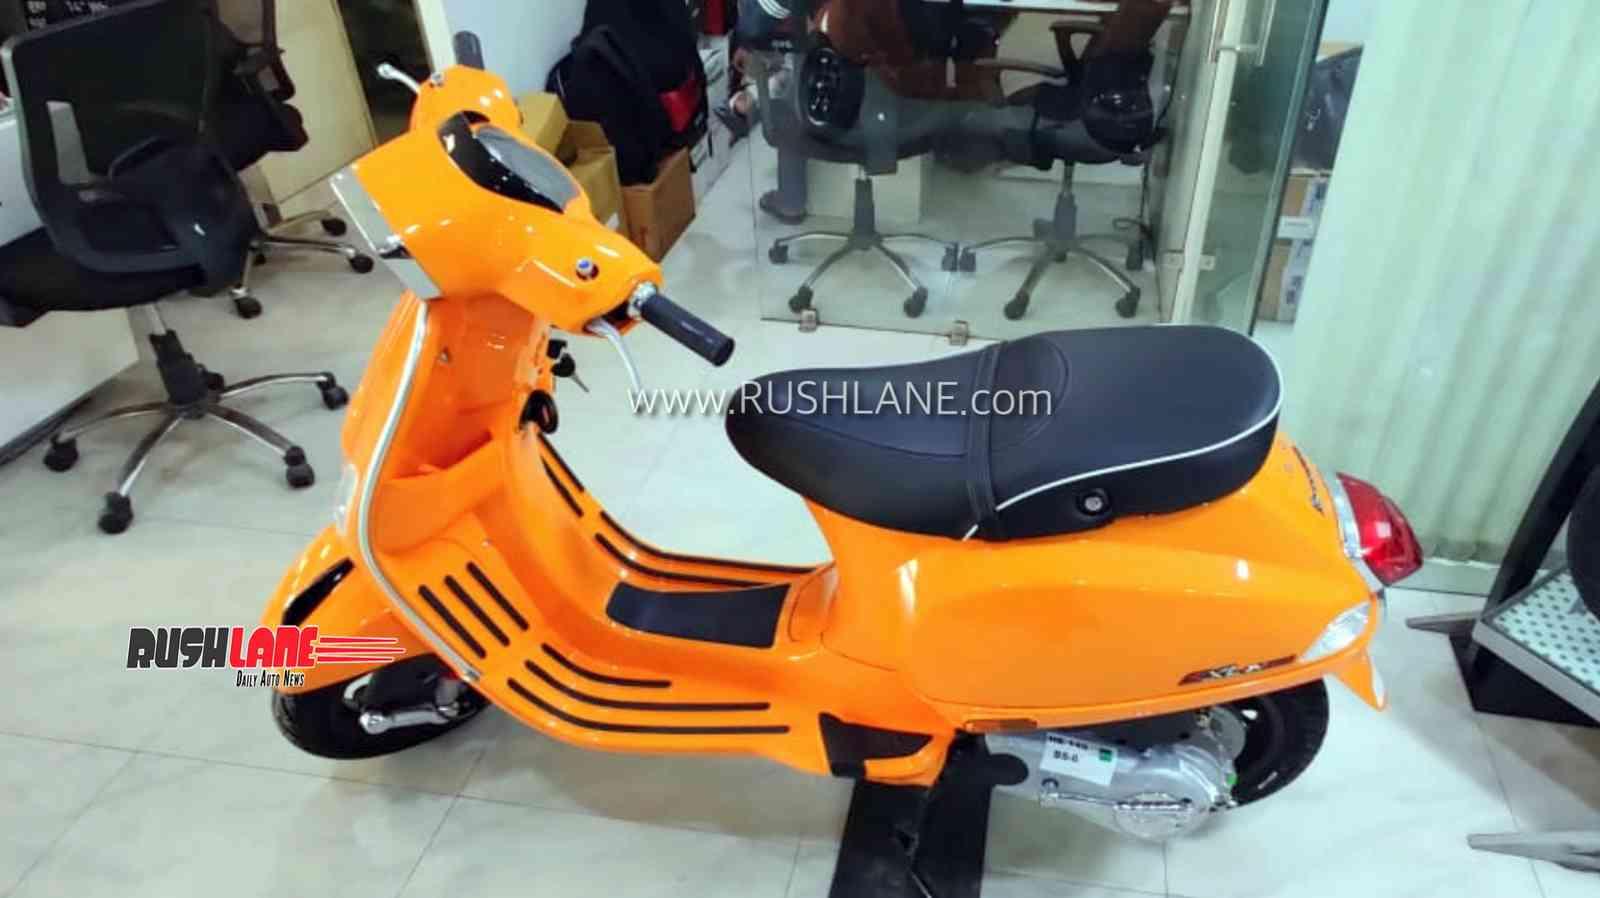 2020 Vespa BS6 scooter